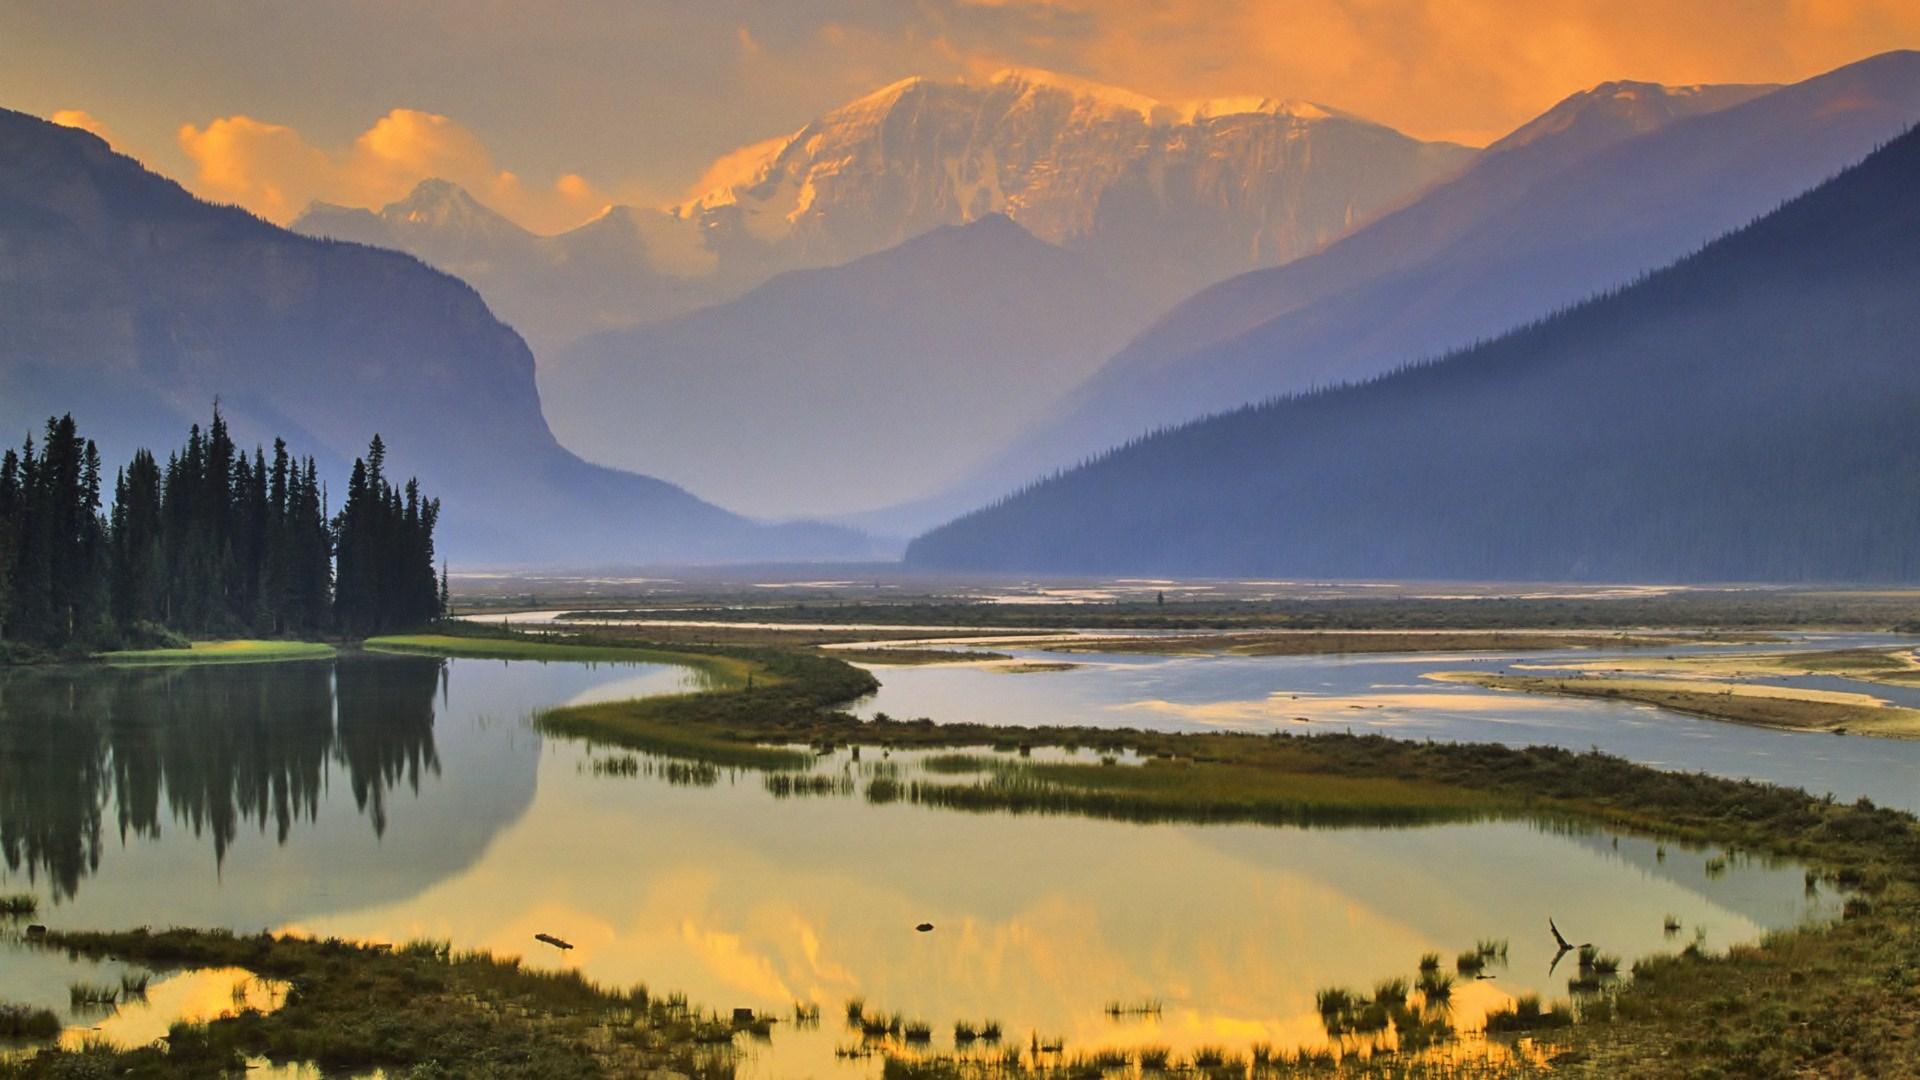 Lake Mountain Reflection Minimalism Wallpapers Hd: Nature Mountain Lake Sunset Reflection Hd Wallpaper